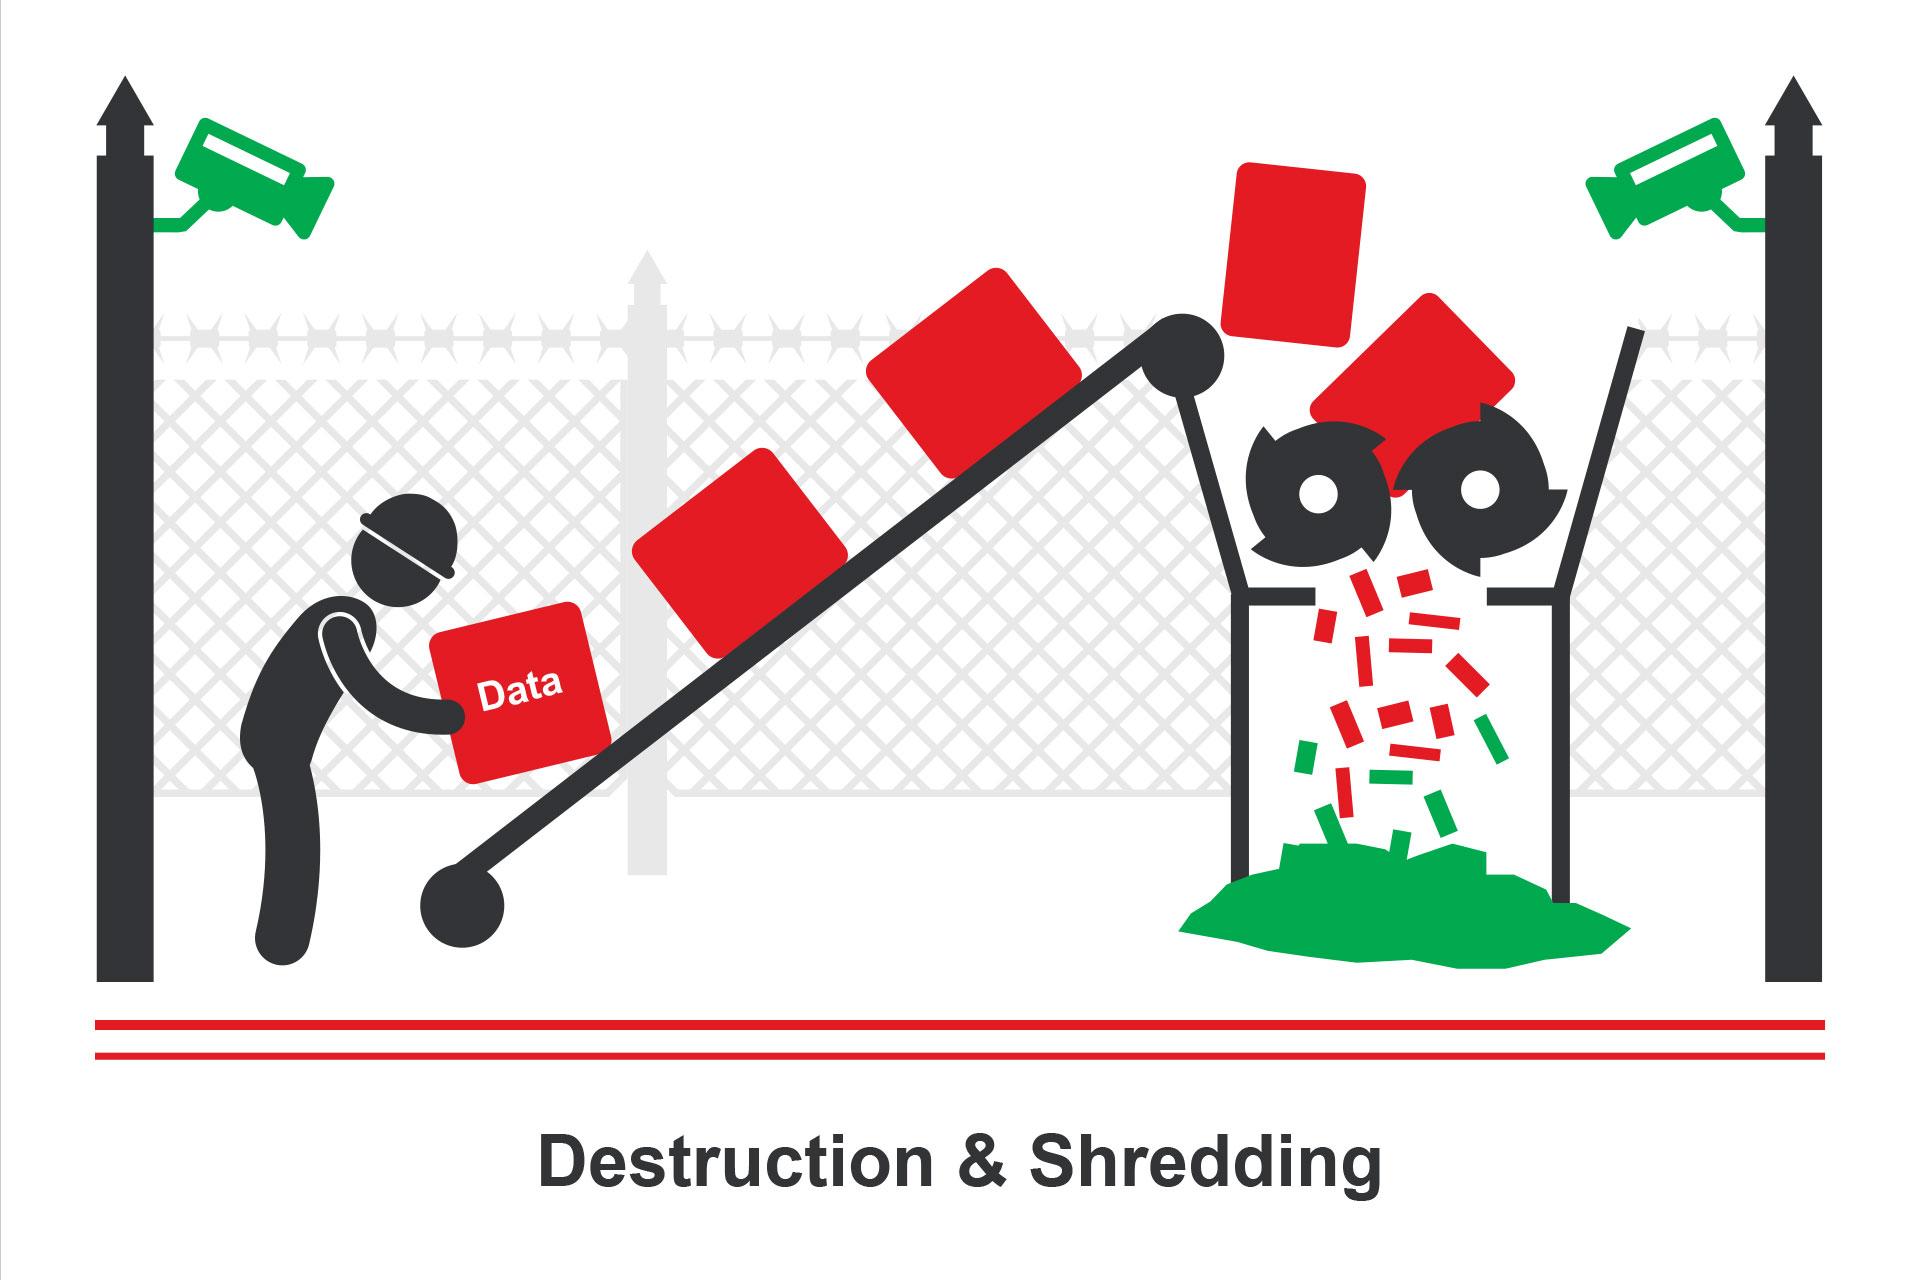 Destruction & Shredding